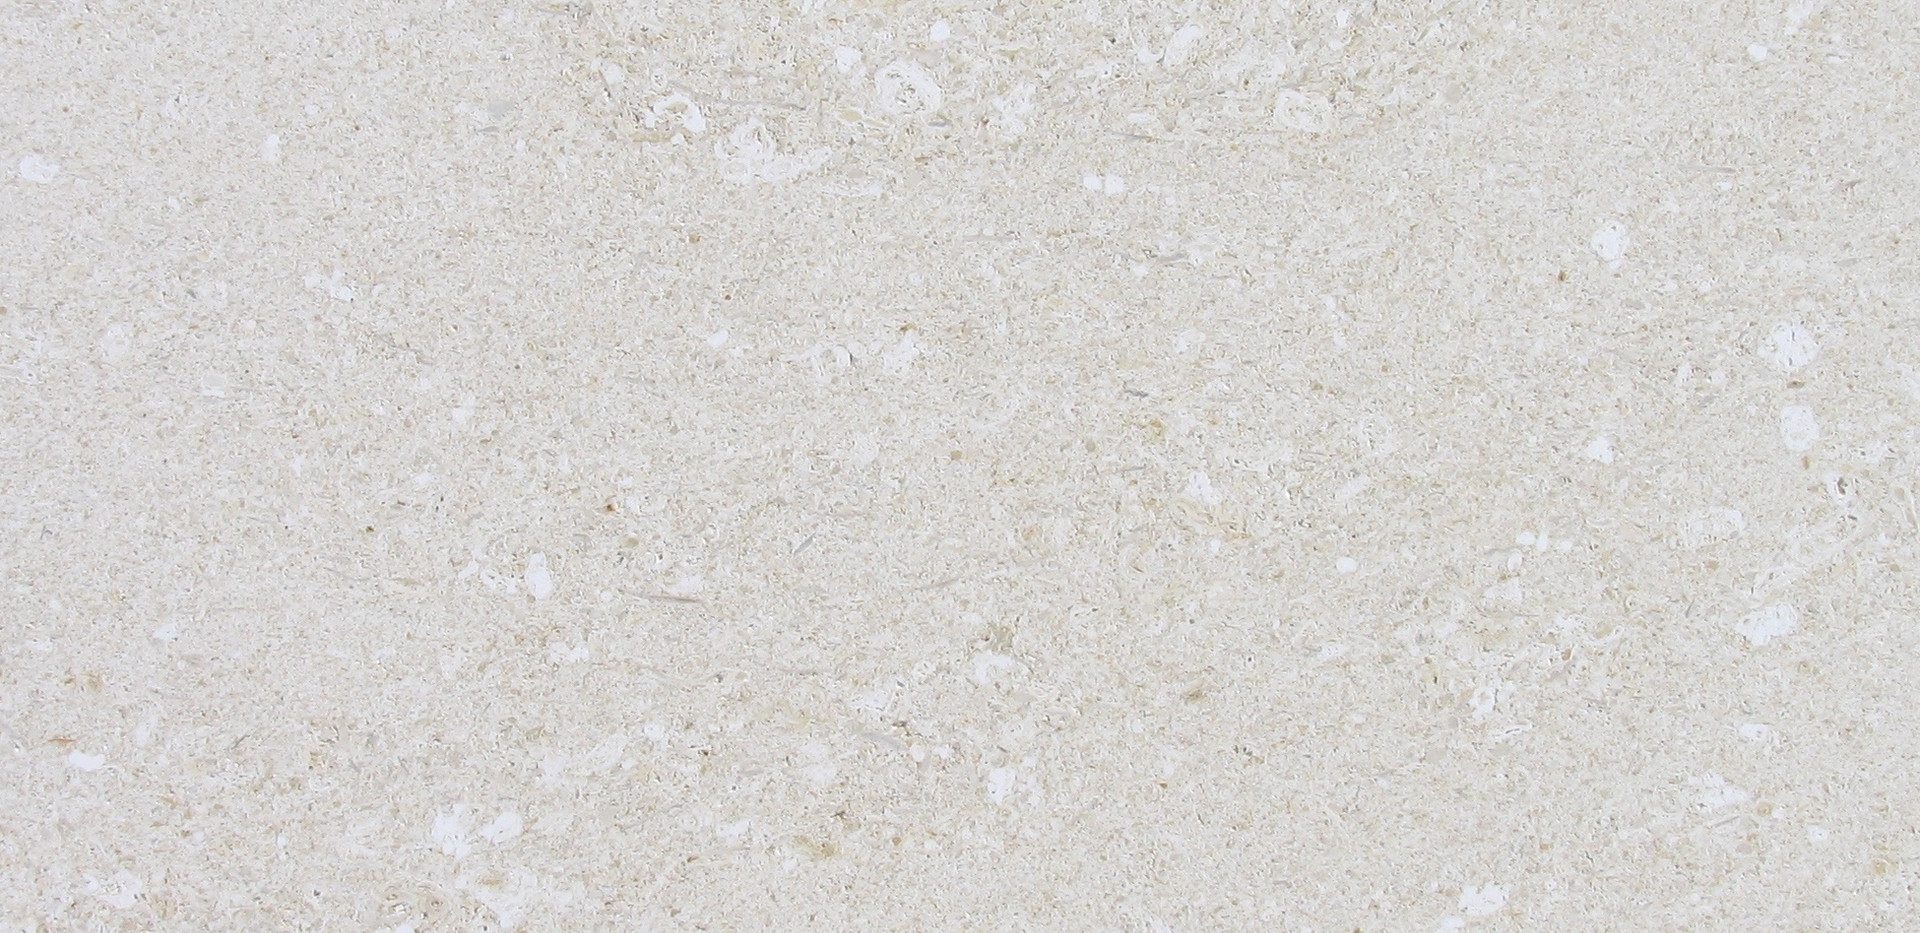 01-bianco-avorio-levigato.jpg